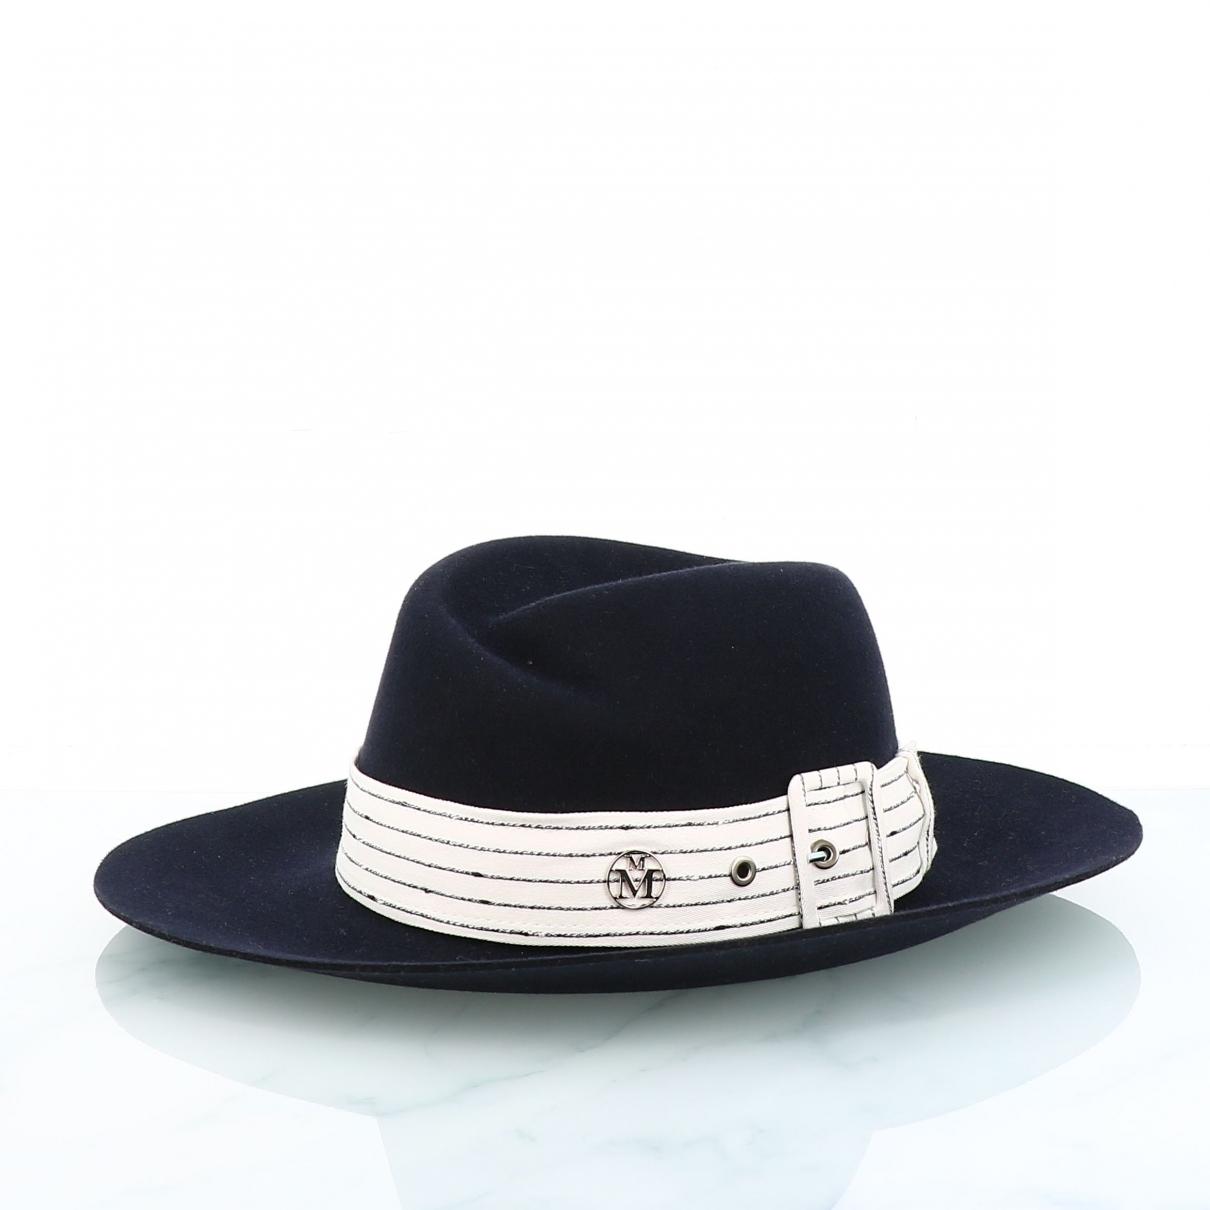 Maison Michel \N Black Wool hat for Women M International